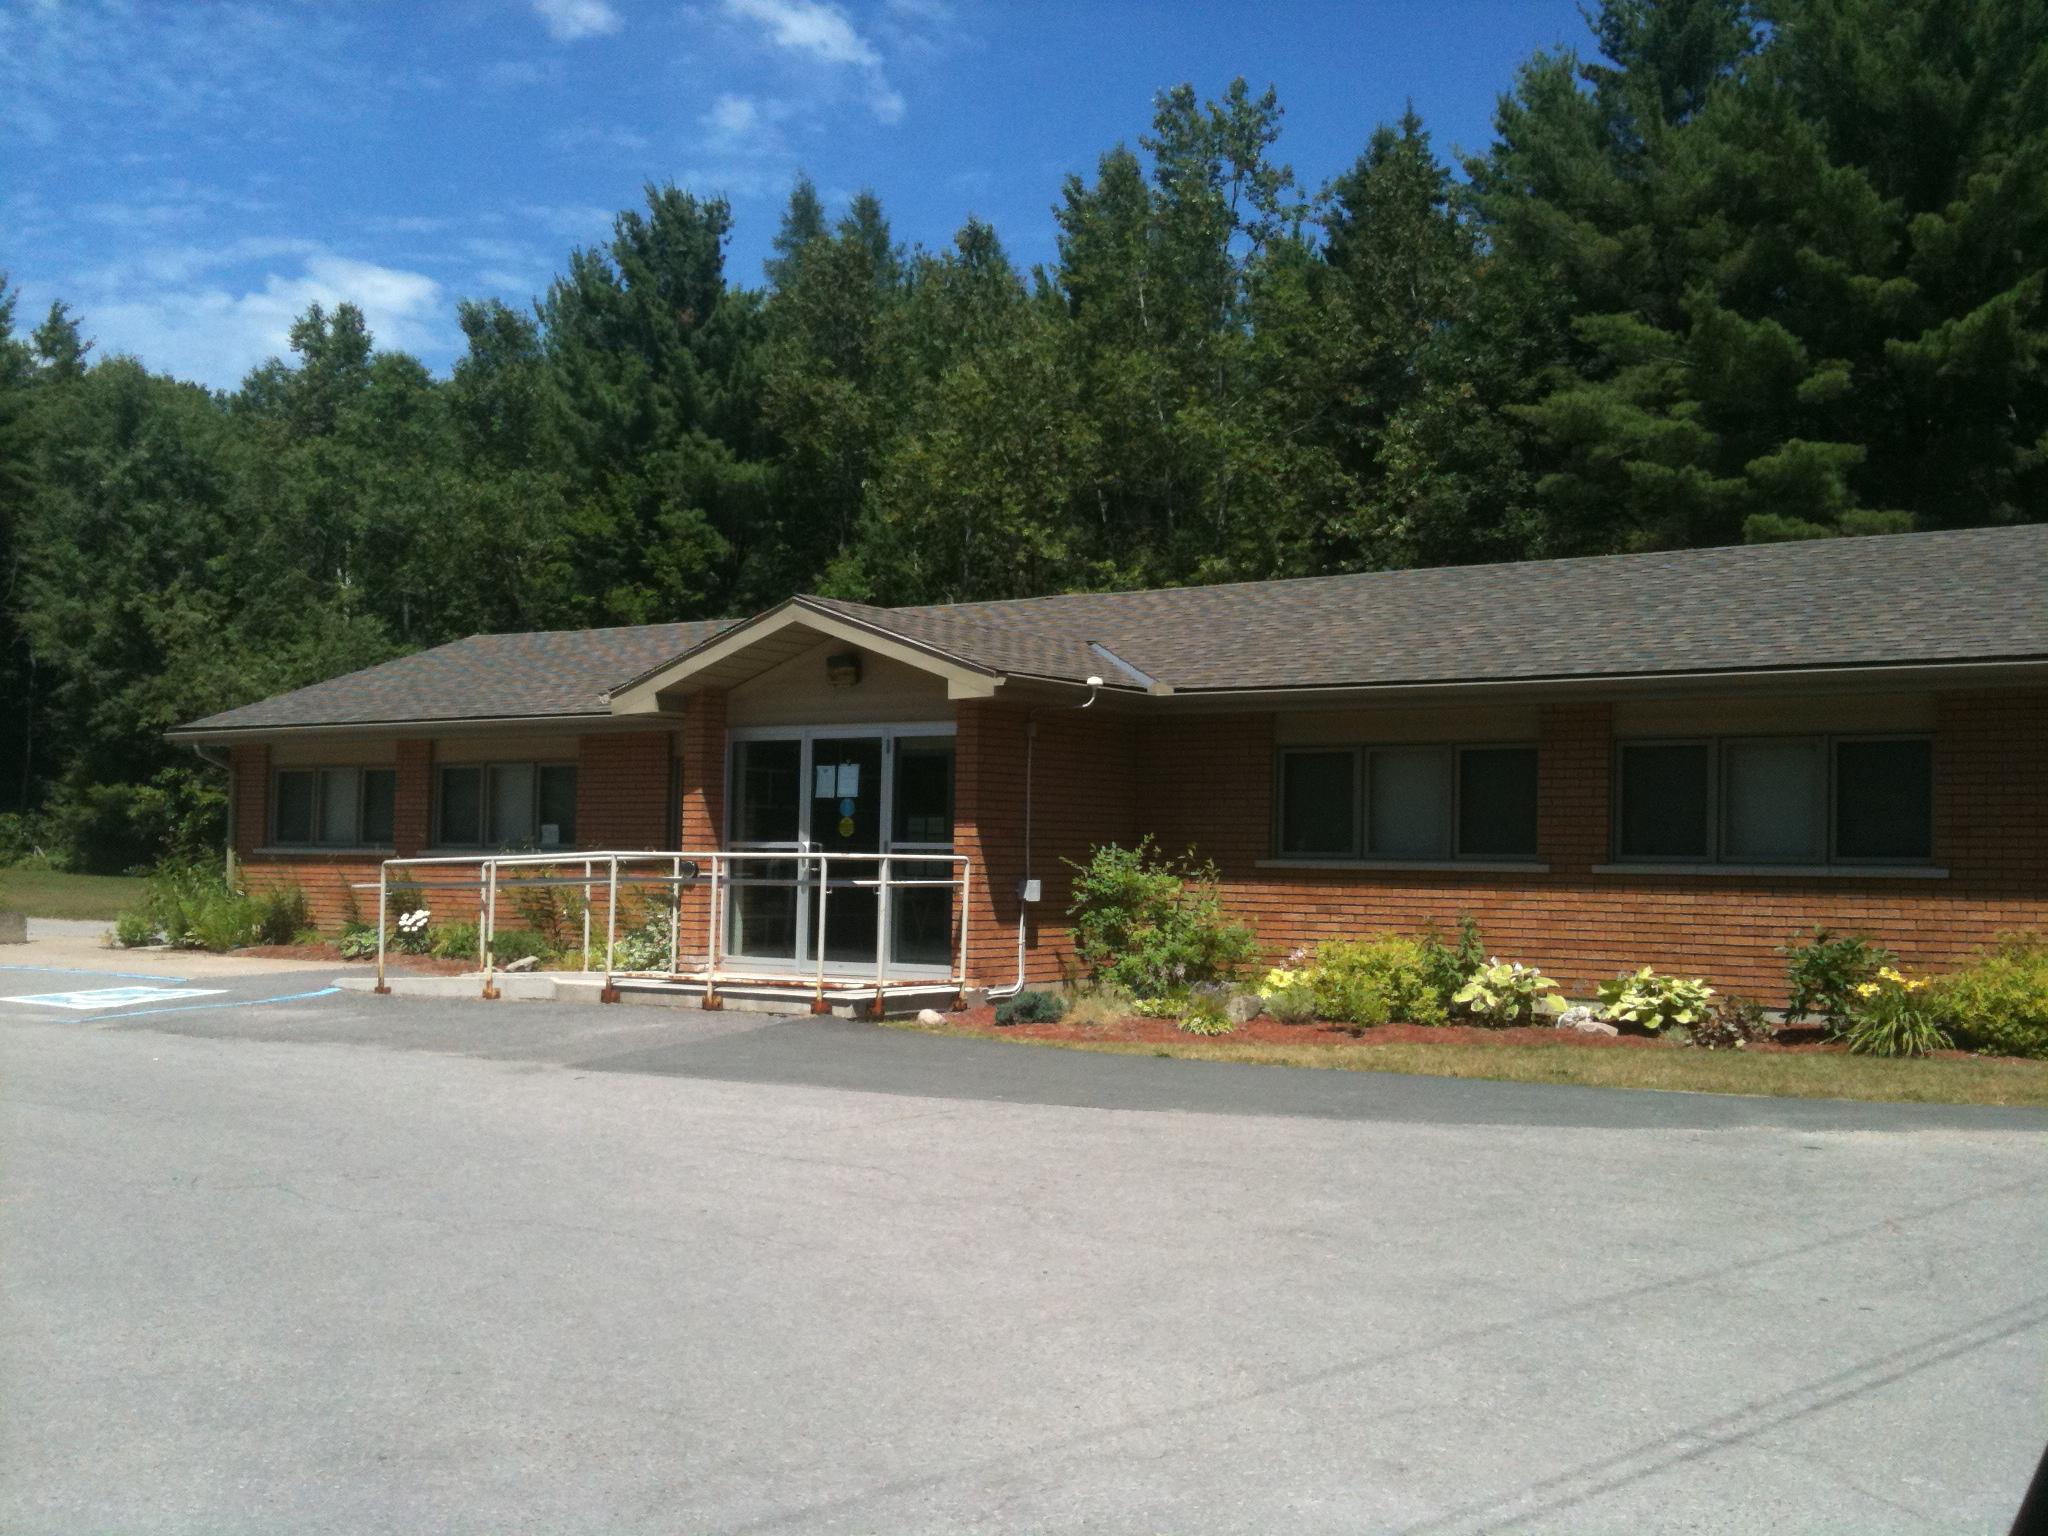 Apsley Medical Center